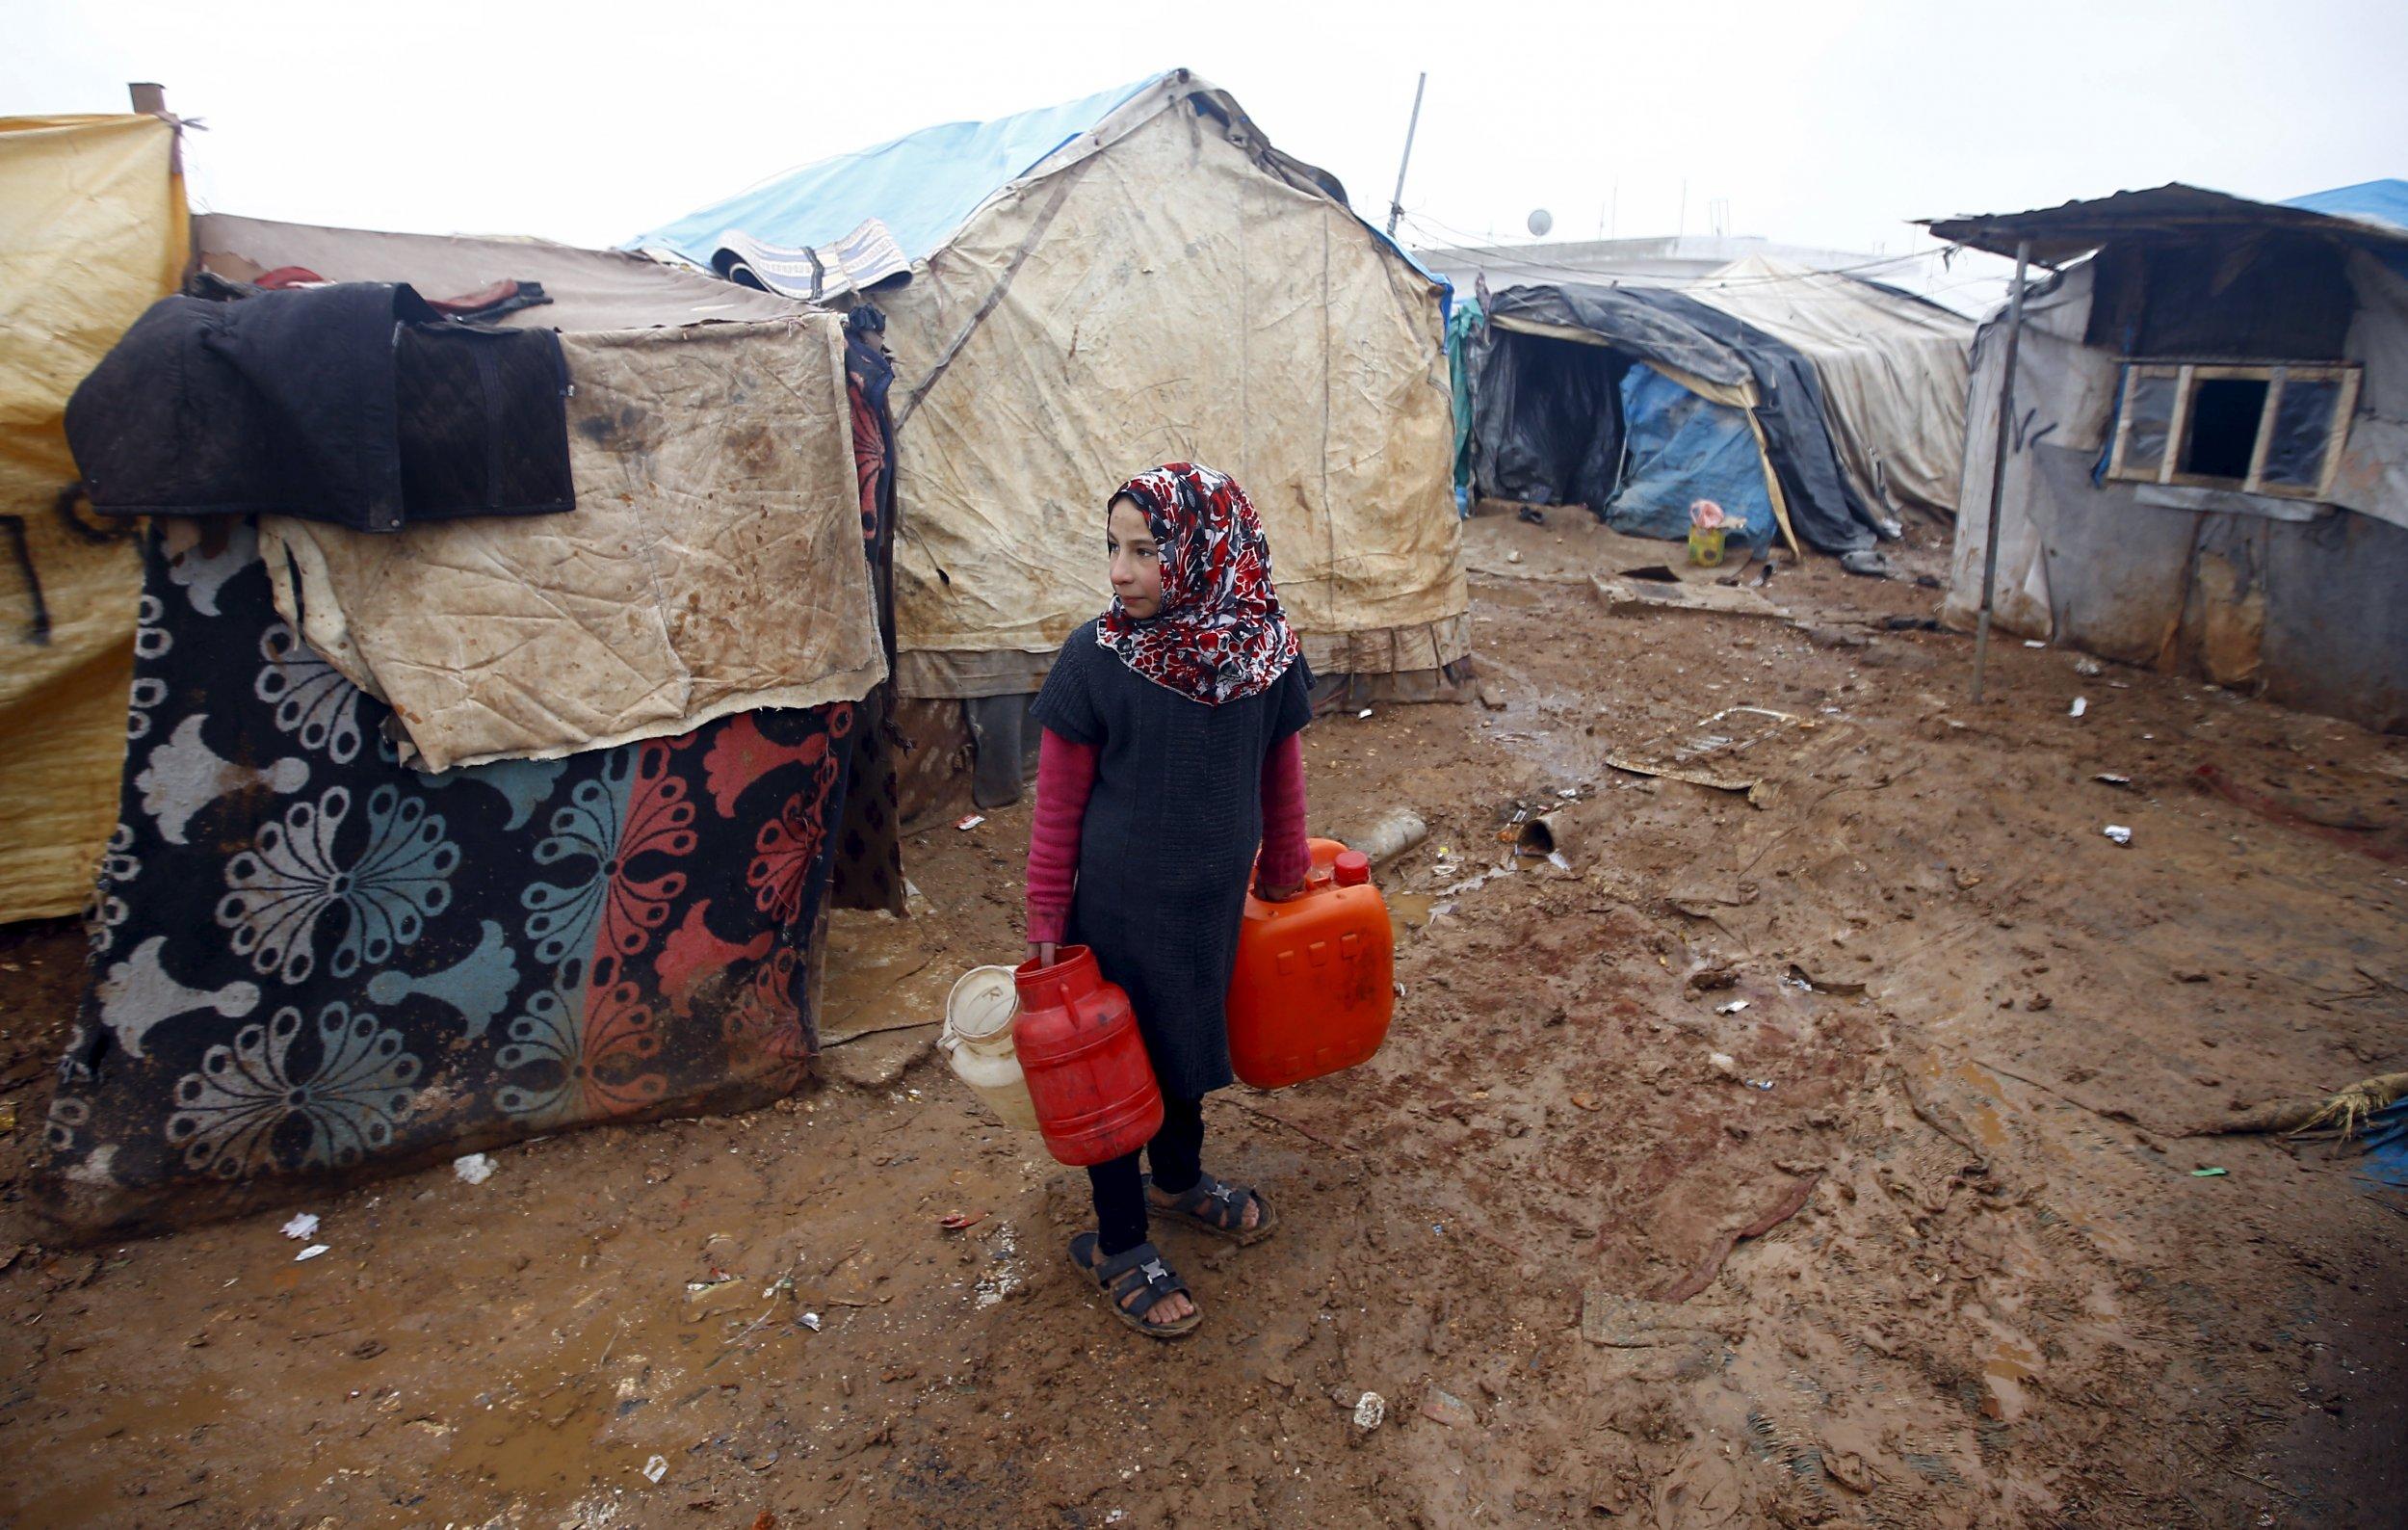 3-15-16 Syrian refugee